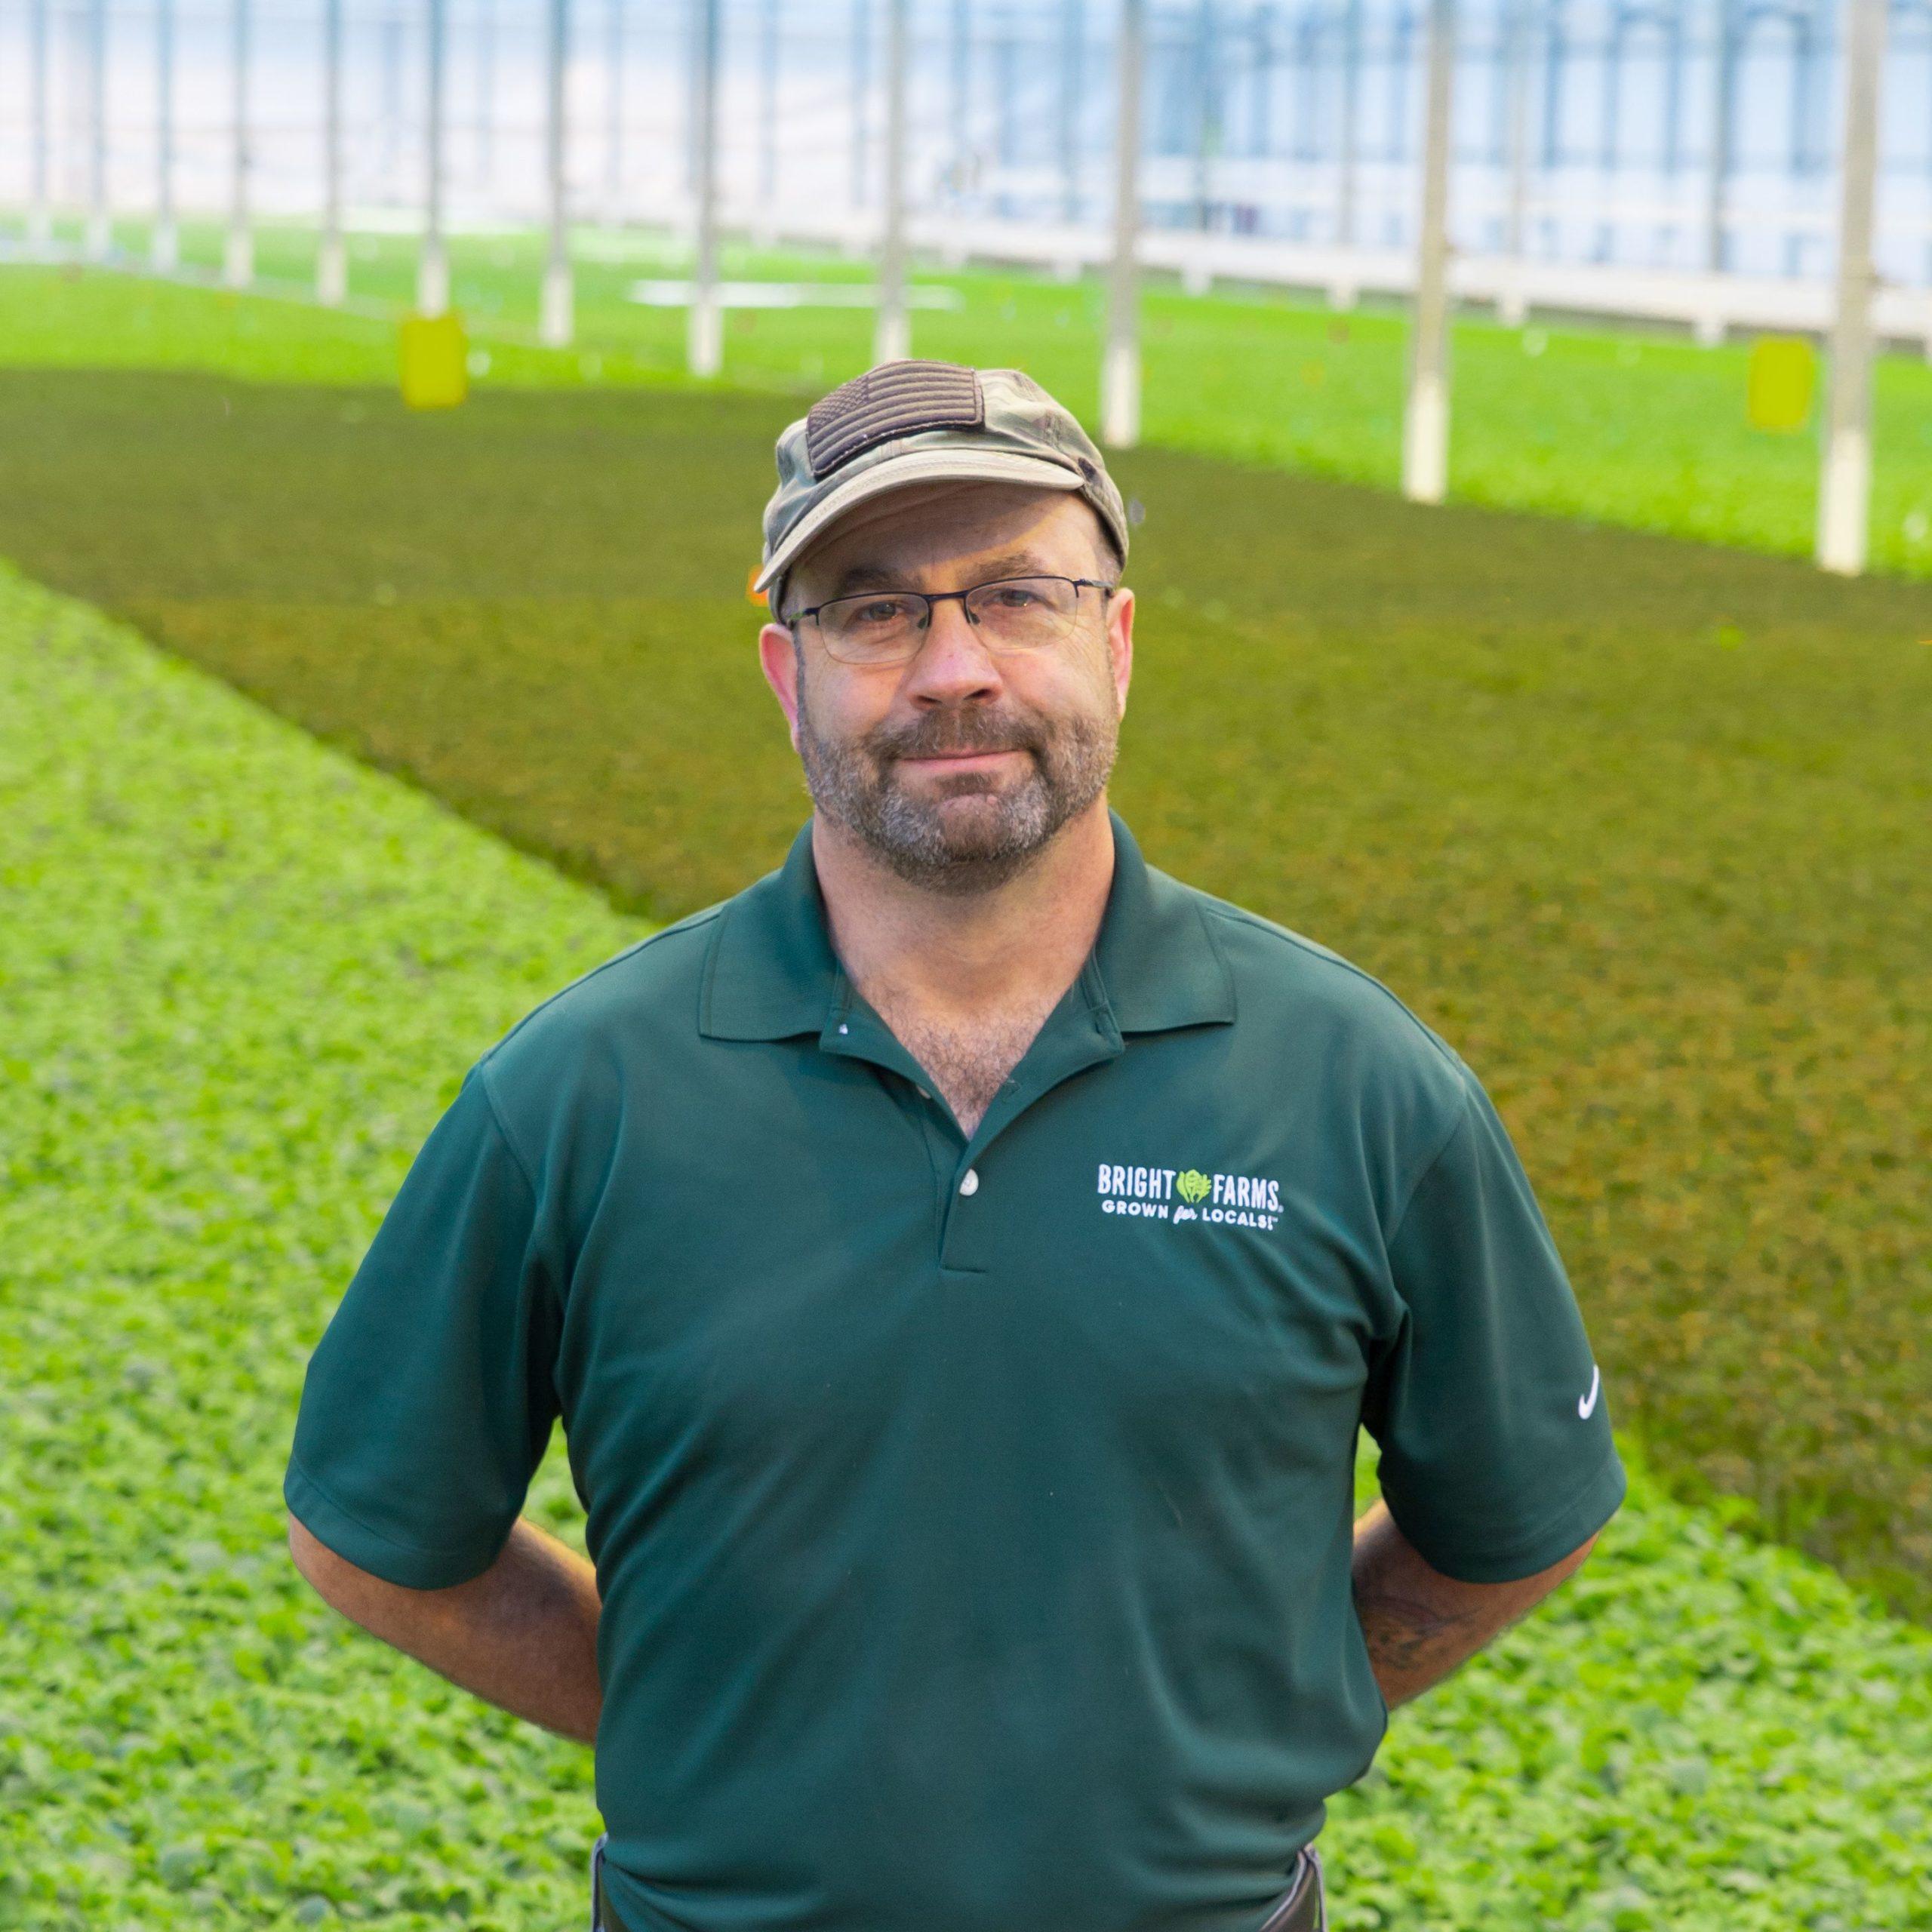 Tony Paar General Manager BrightFarms PENN PEN Greenhouse